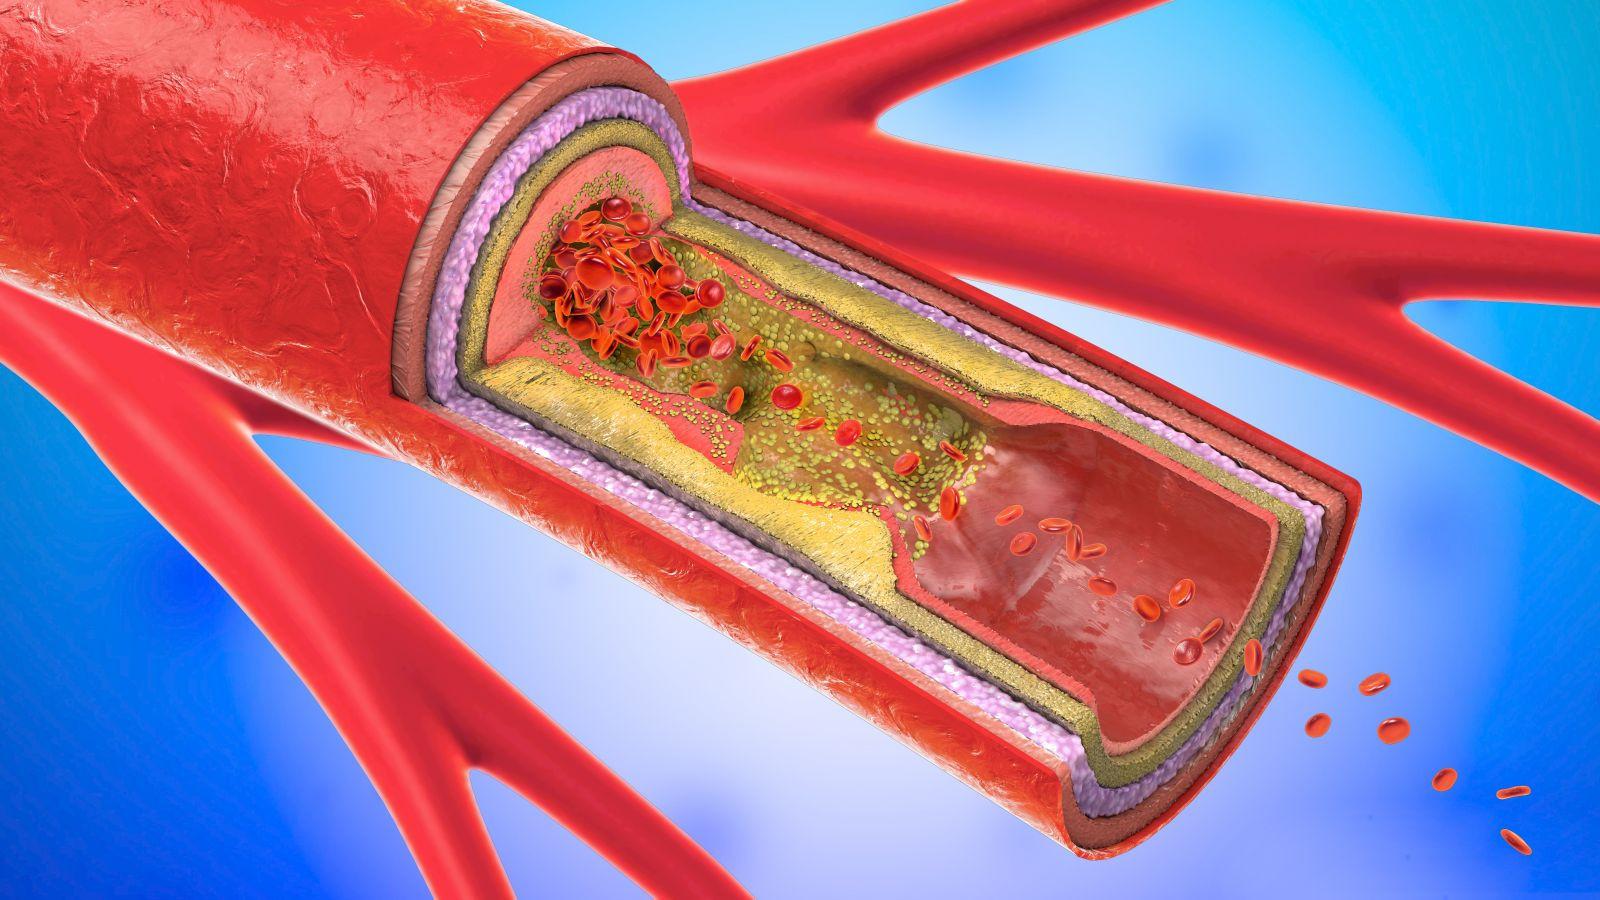 carotid artery